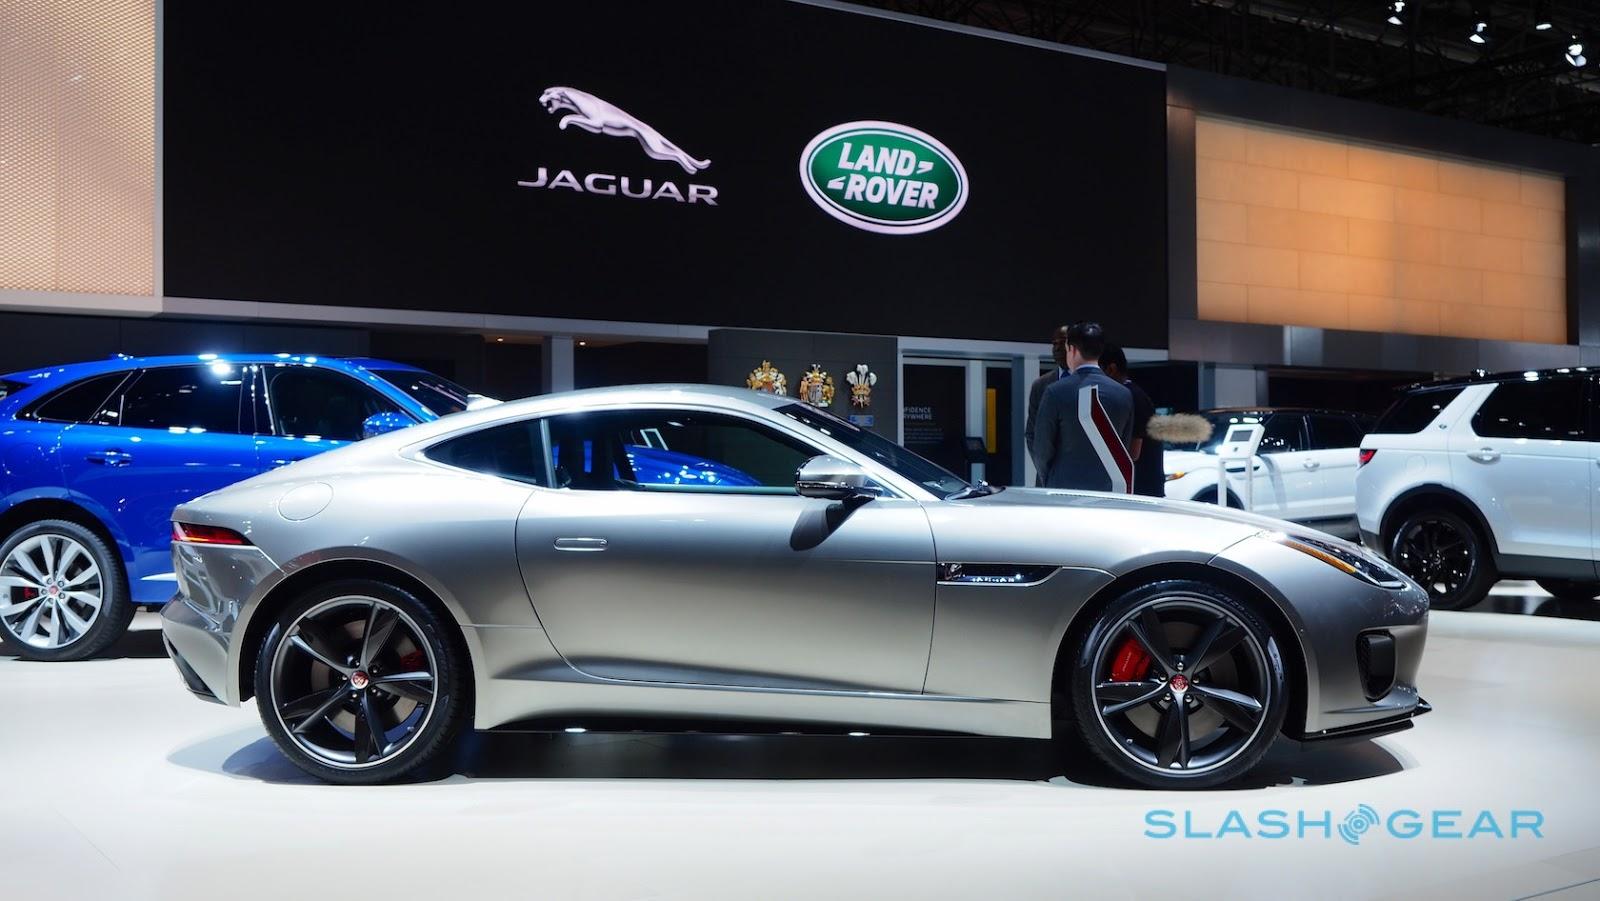 ultimate cars bikes new jaguar f type with 300hp and 4 cylinder engine. Black Bedroom Furniture Sets. Home Design Ideas